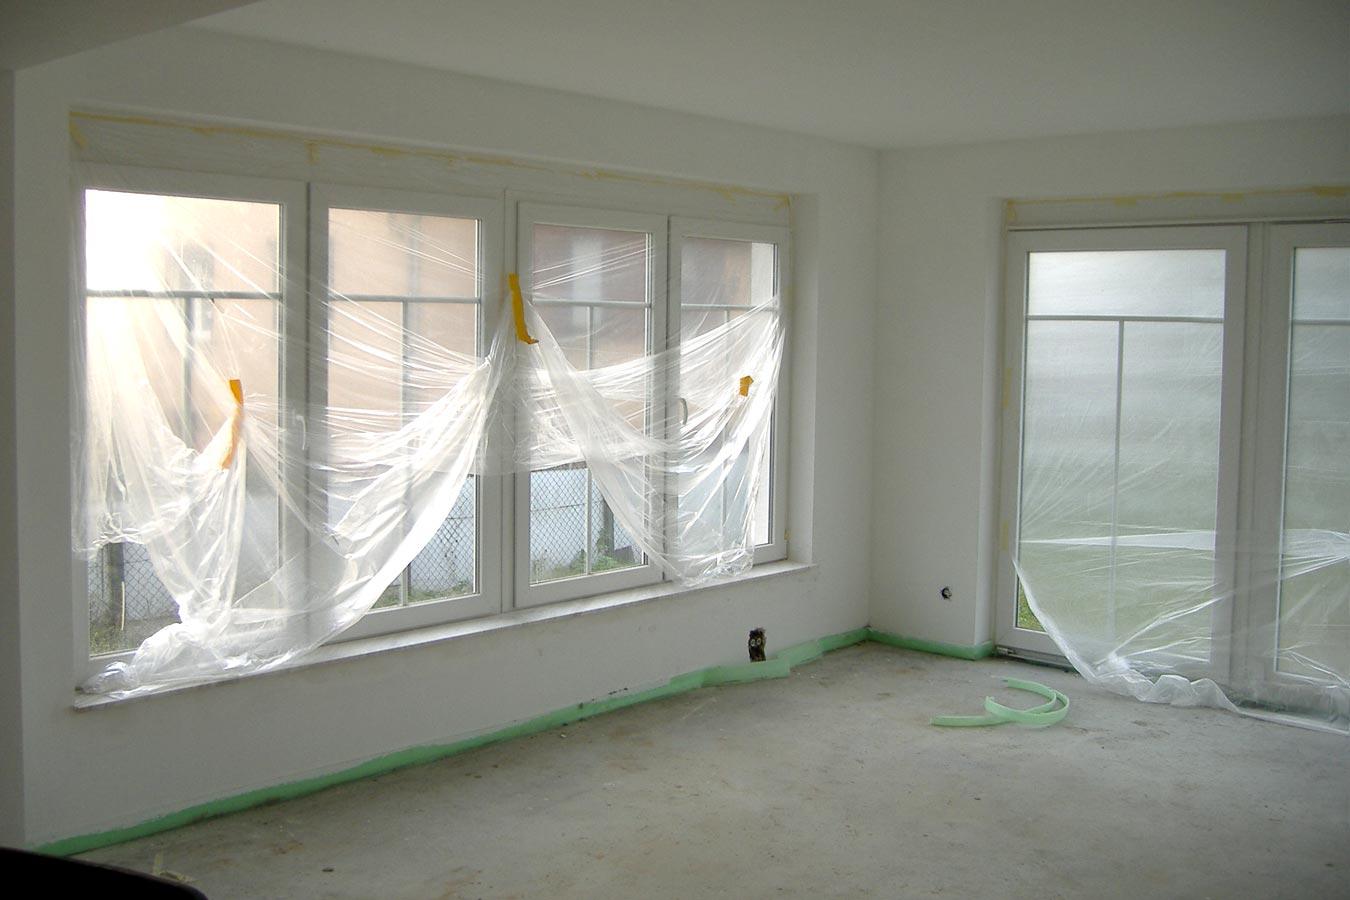 baustellenimpressionen willkommen bei der templiner. Black Bedroom Furniture Sets. Home Design Ideas